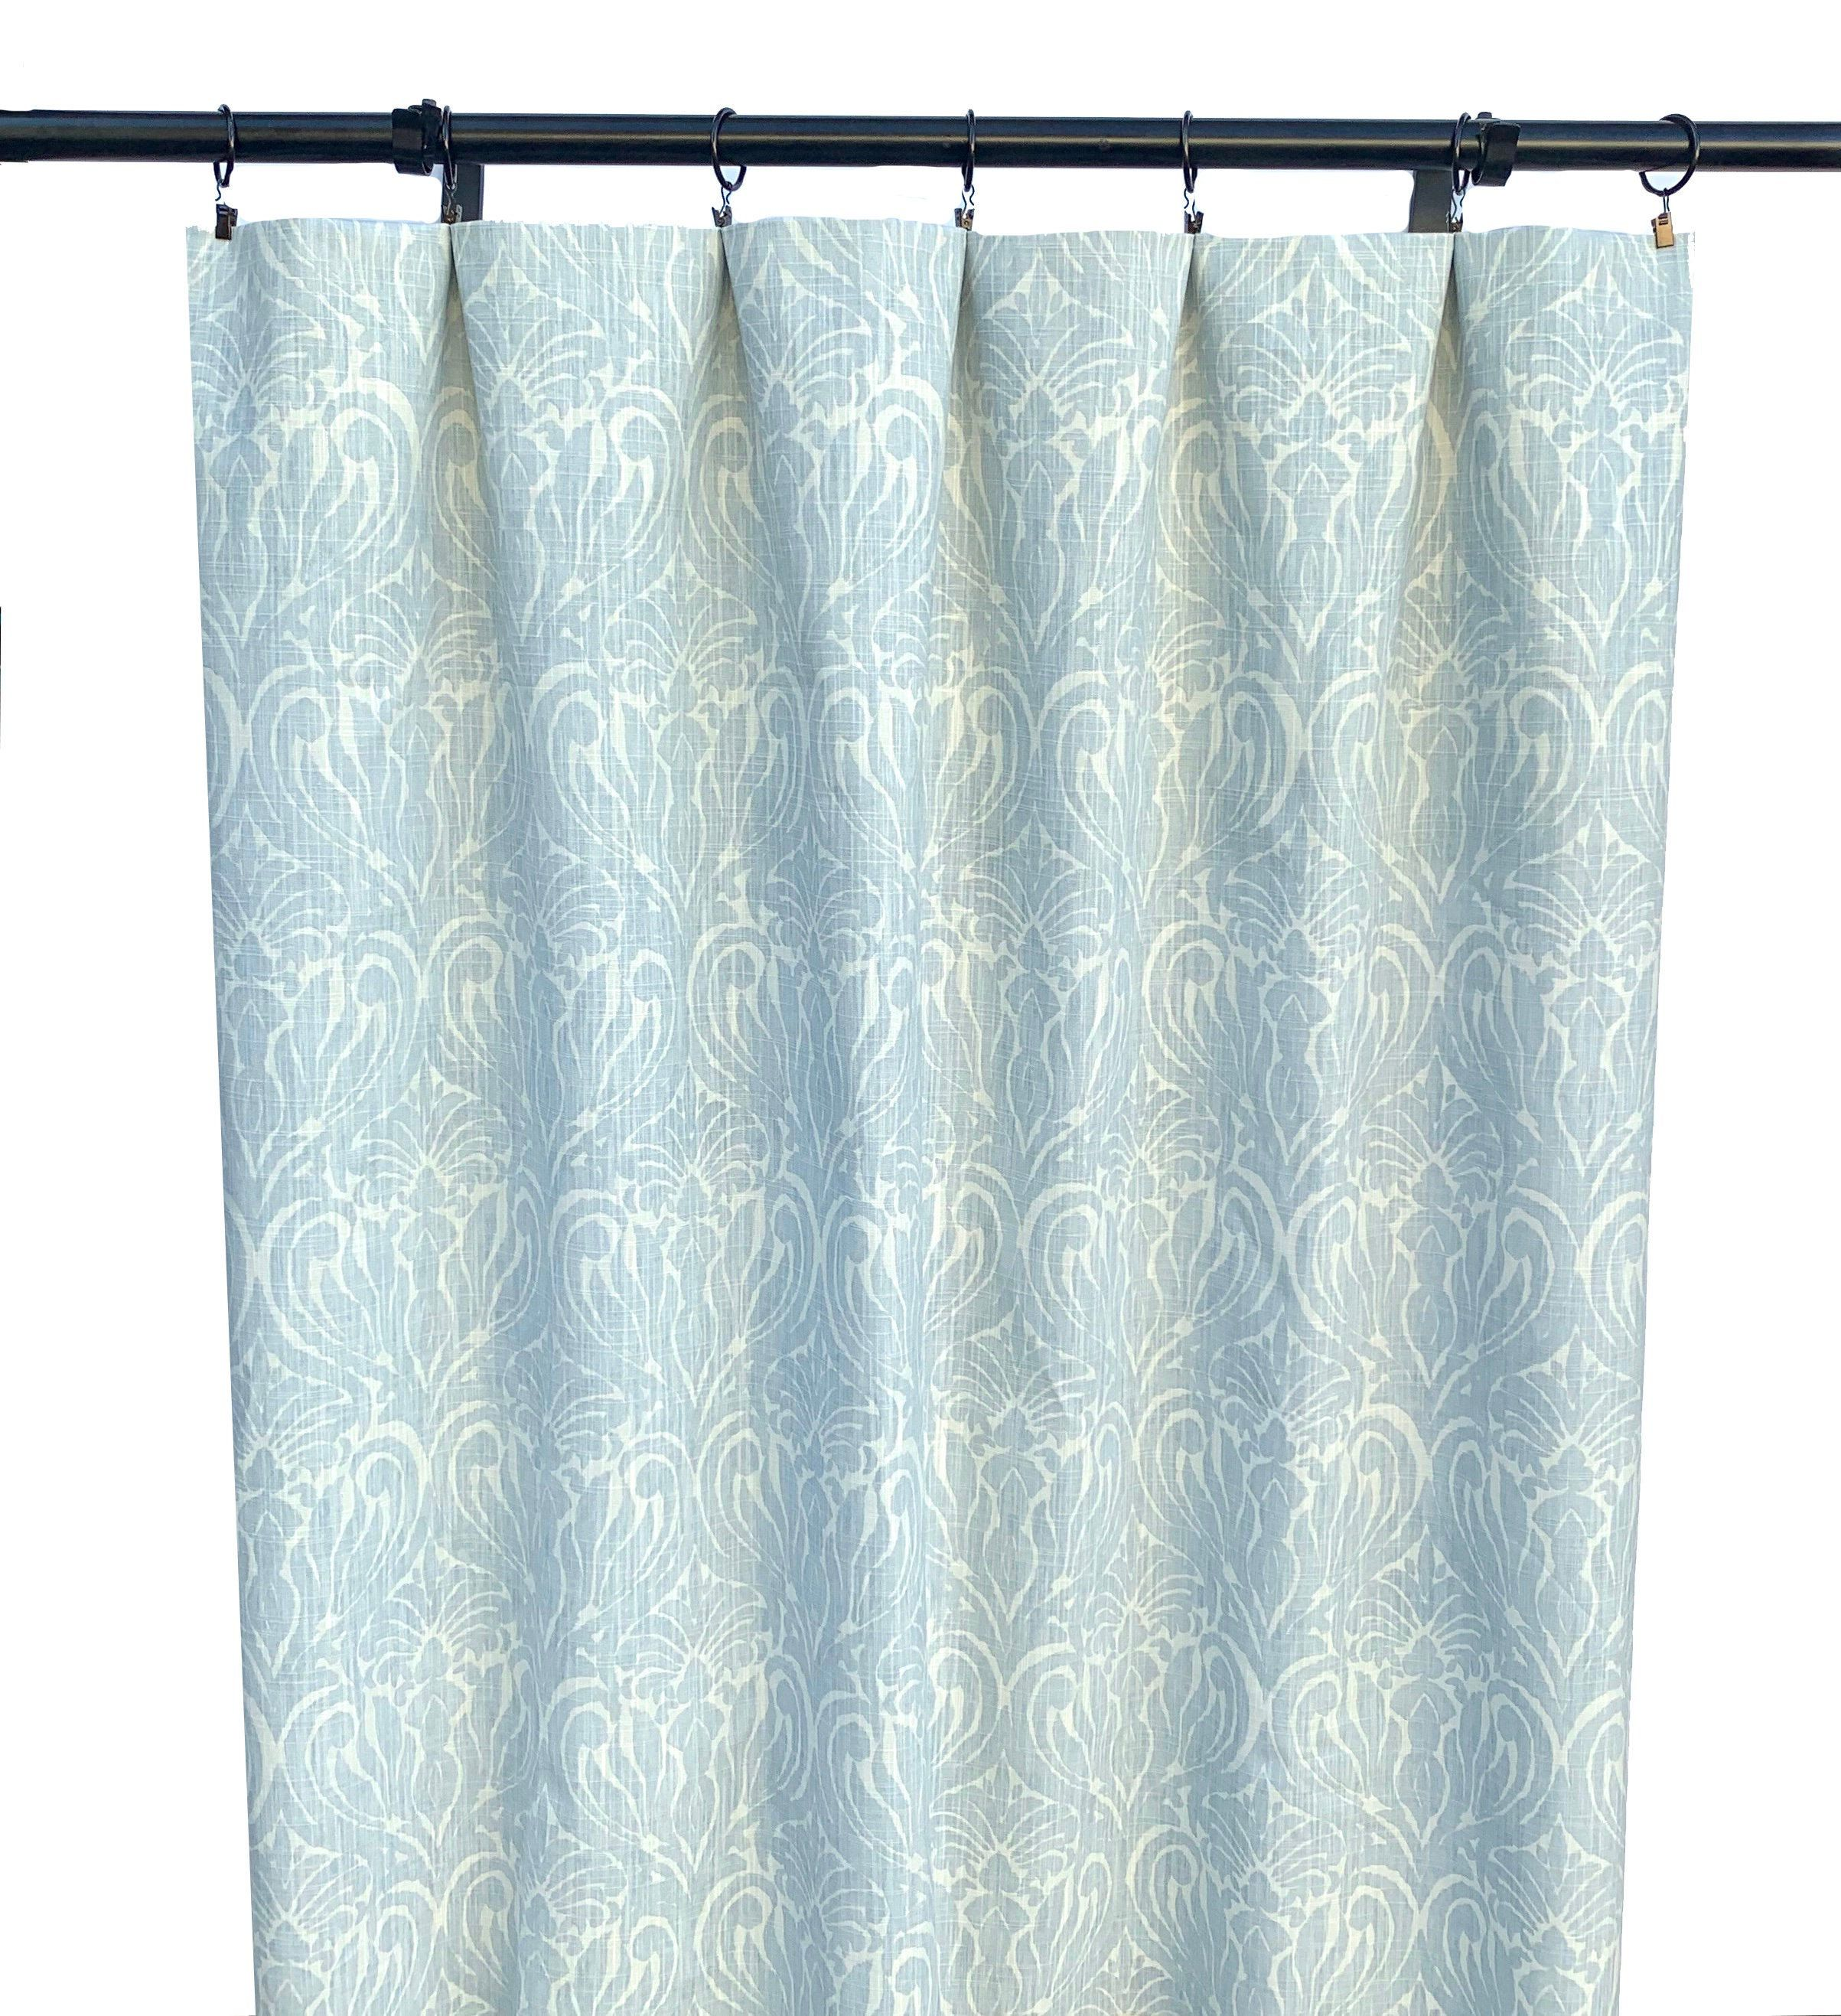 Ice Light Blue Curtain Panels 2 Curtain Panels Floral Blue